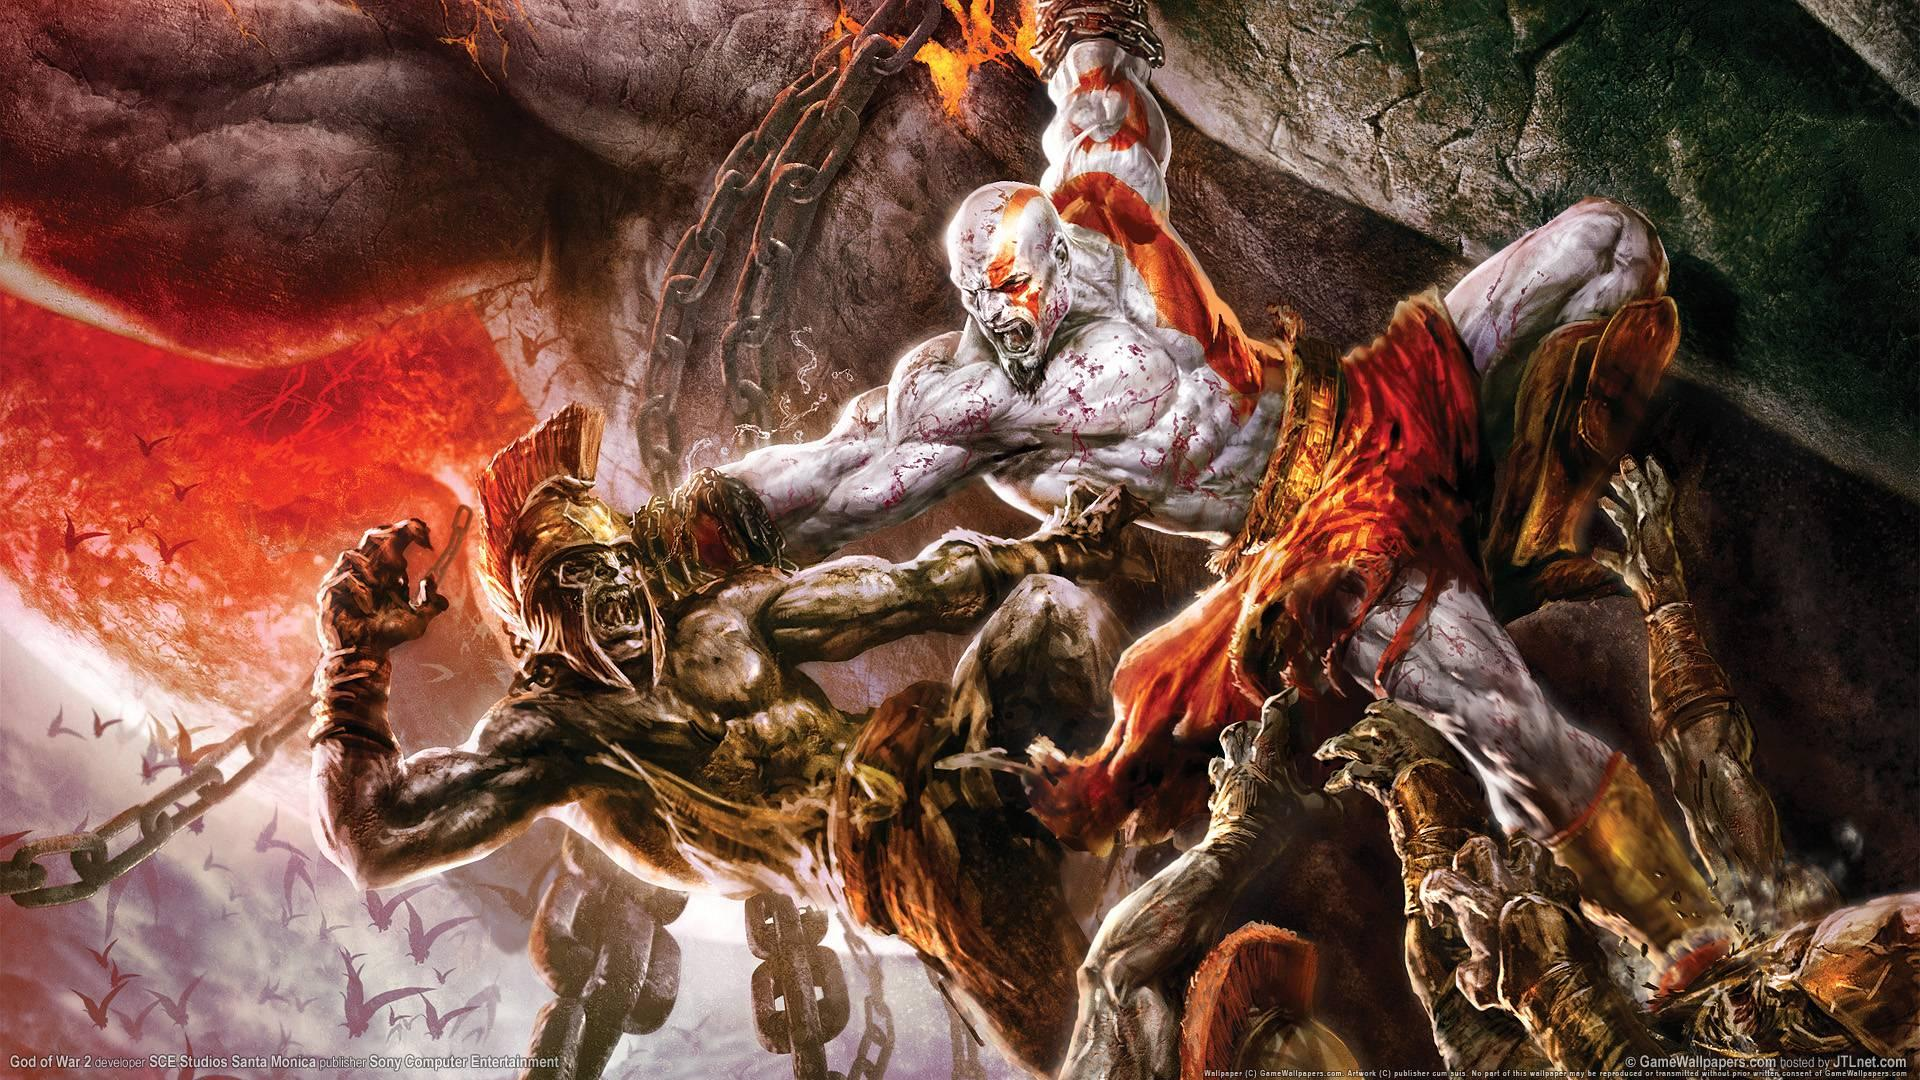 Download God Of War Wallpaper 1080p Hd Backgrounds Download Itl Cat